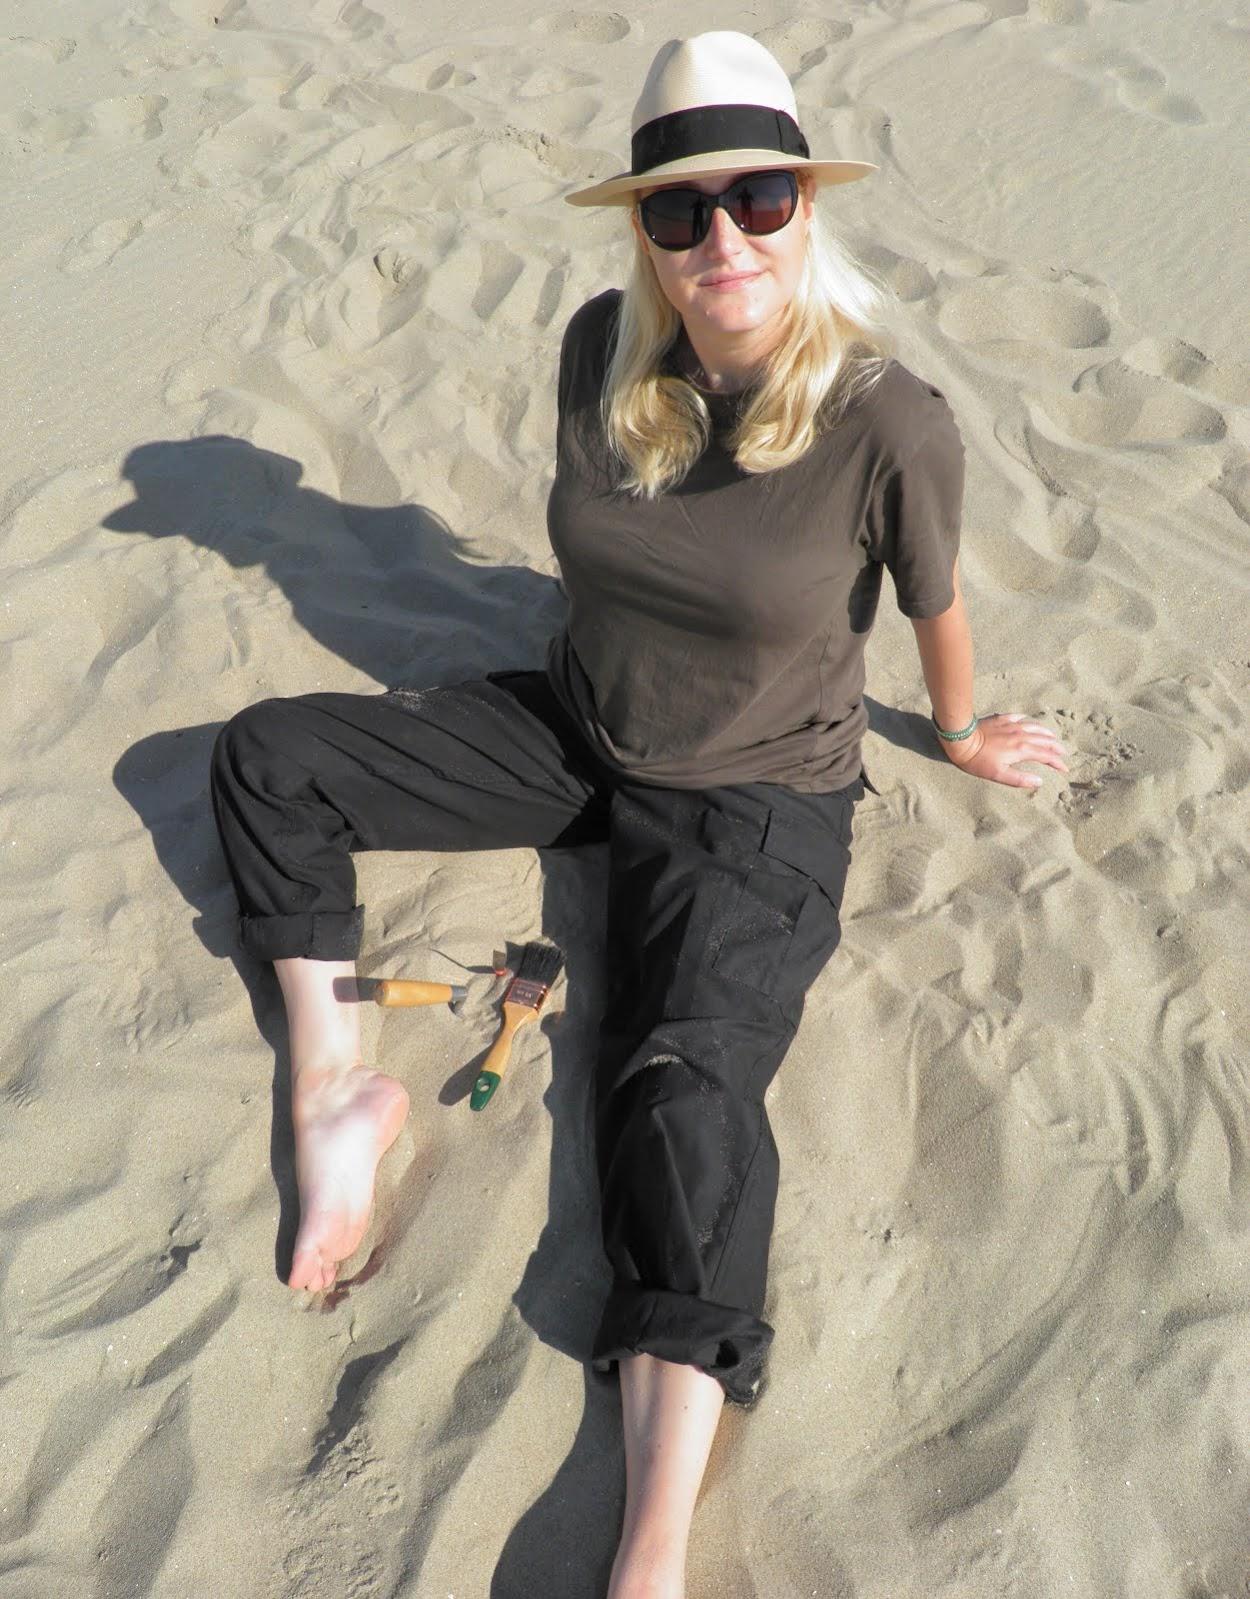 Official Facebook Page Archaeologist & Maternal Health Ambassador Ticia Verveer